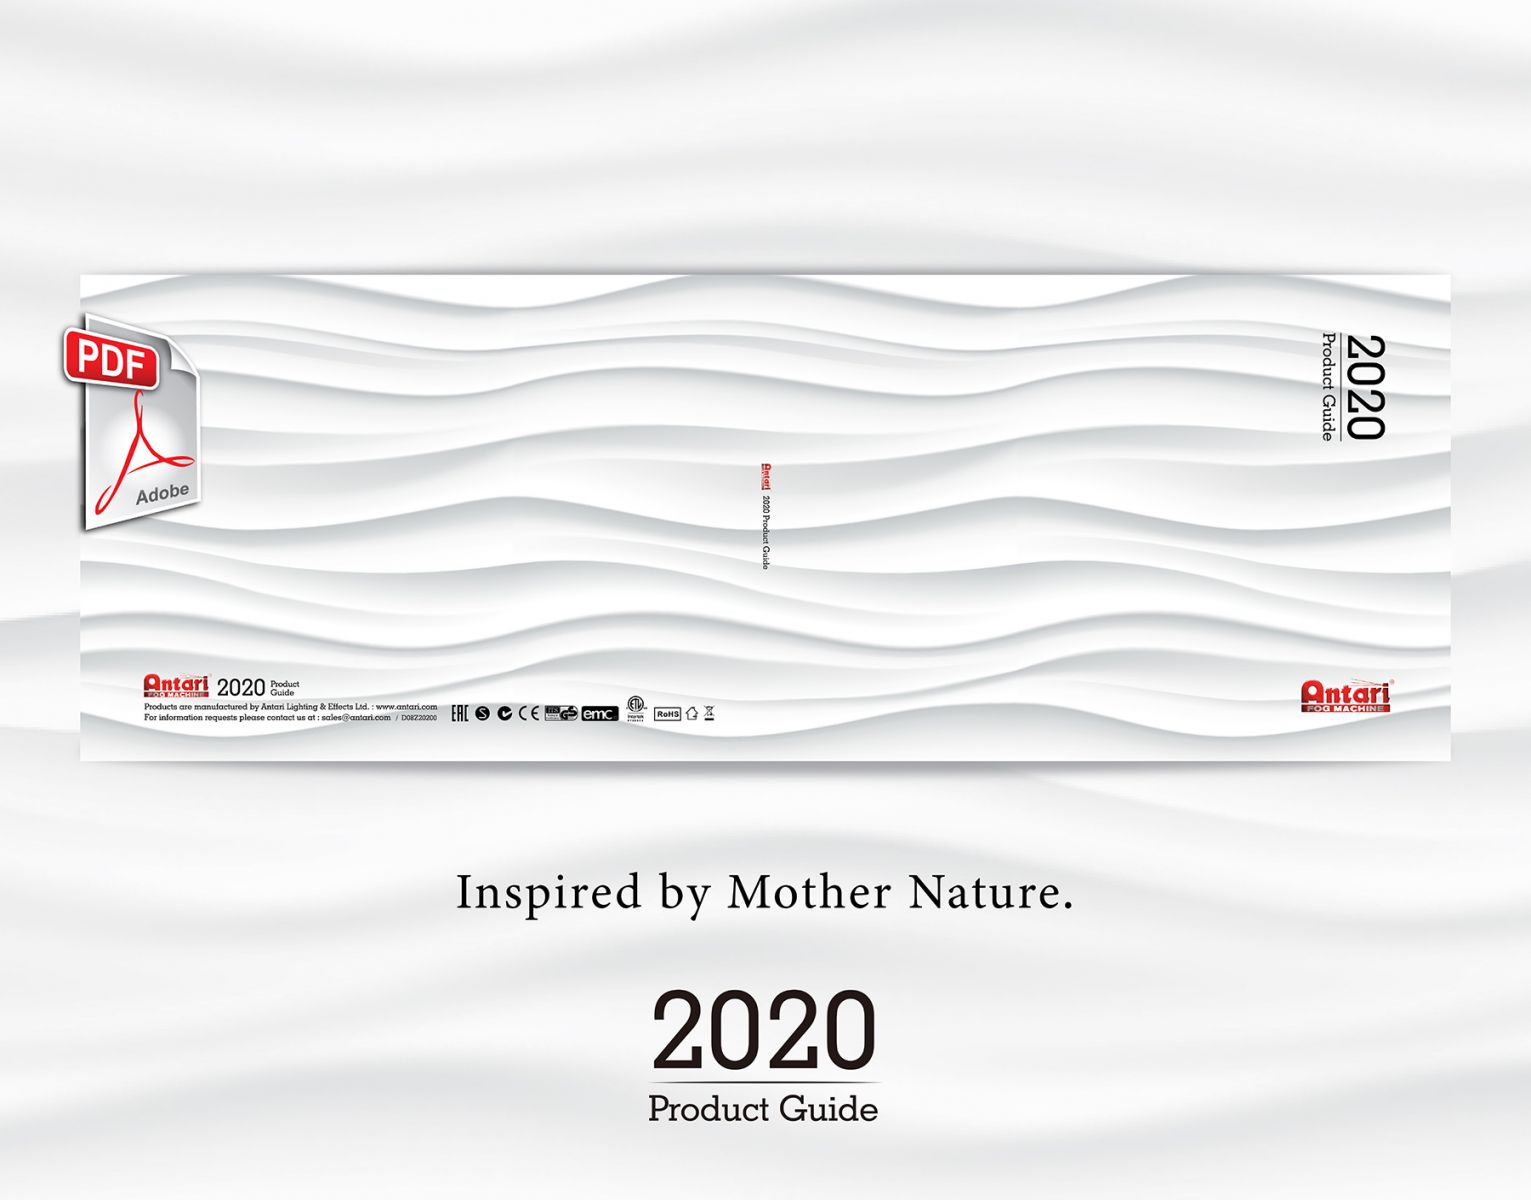 Antari 2020 產品指南 (英文版本) 已釋出,中文版本將於近期發佈